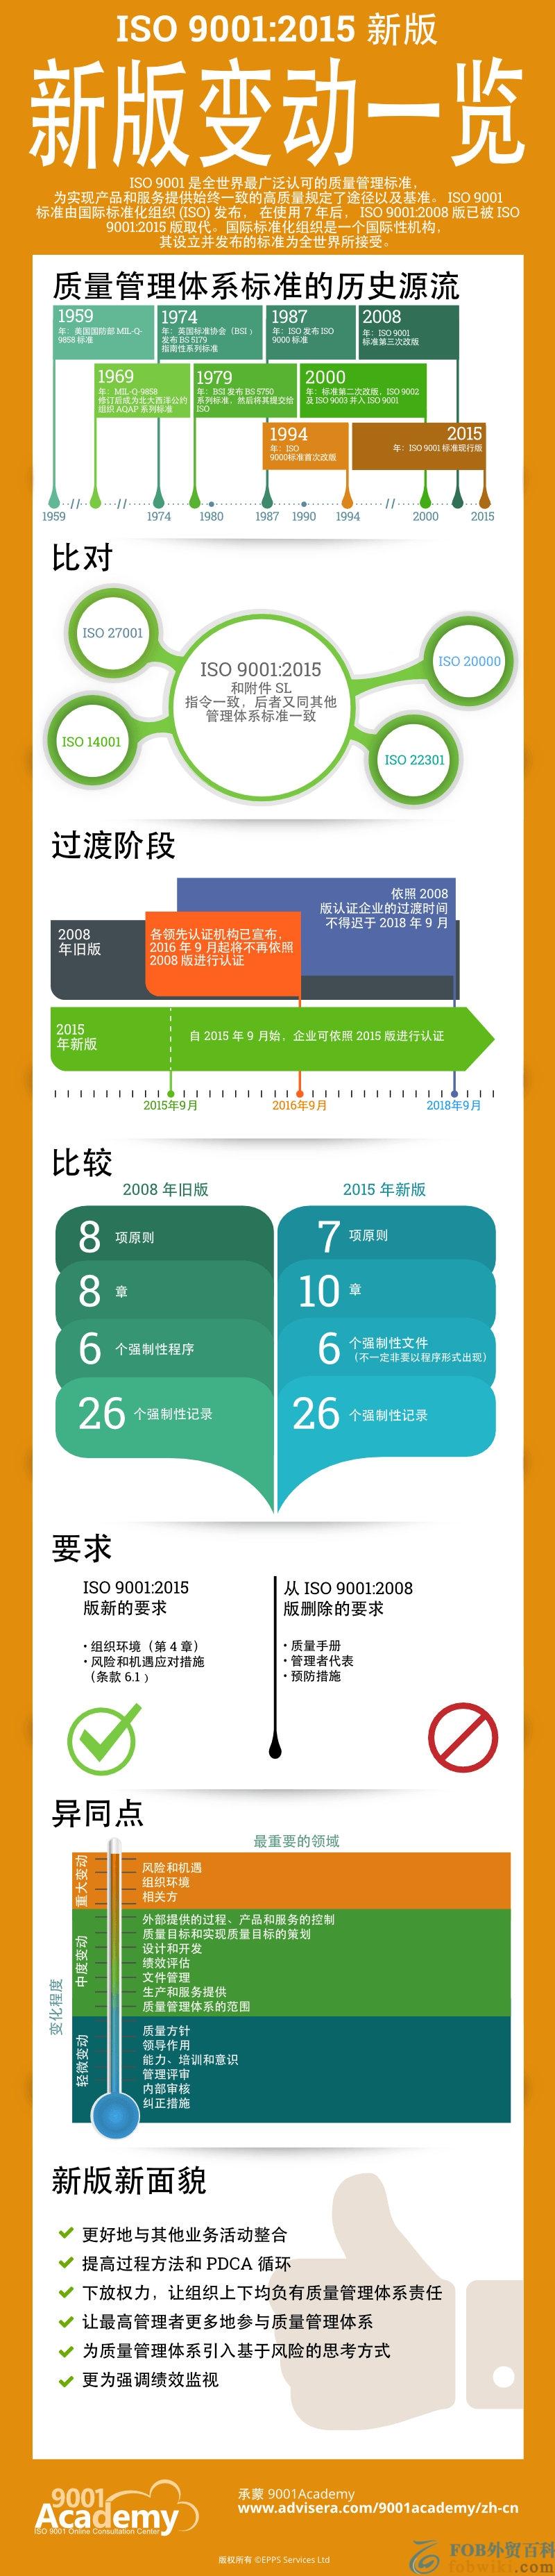 ISO 9001 之 2015 版同 2008 版对比